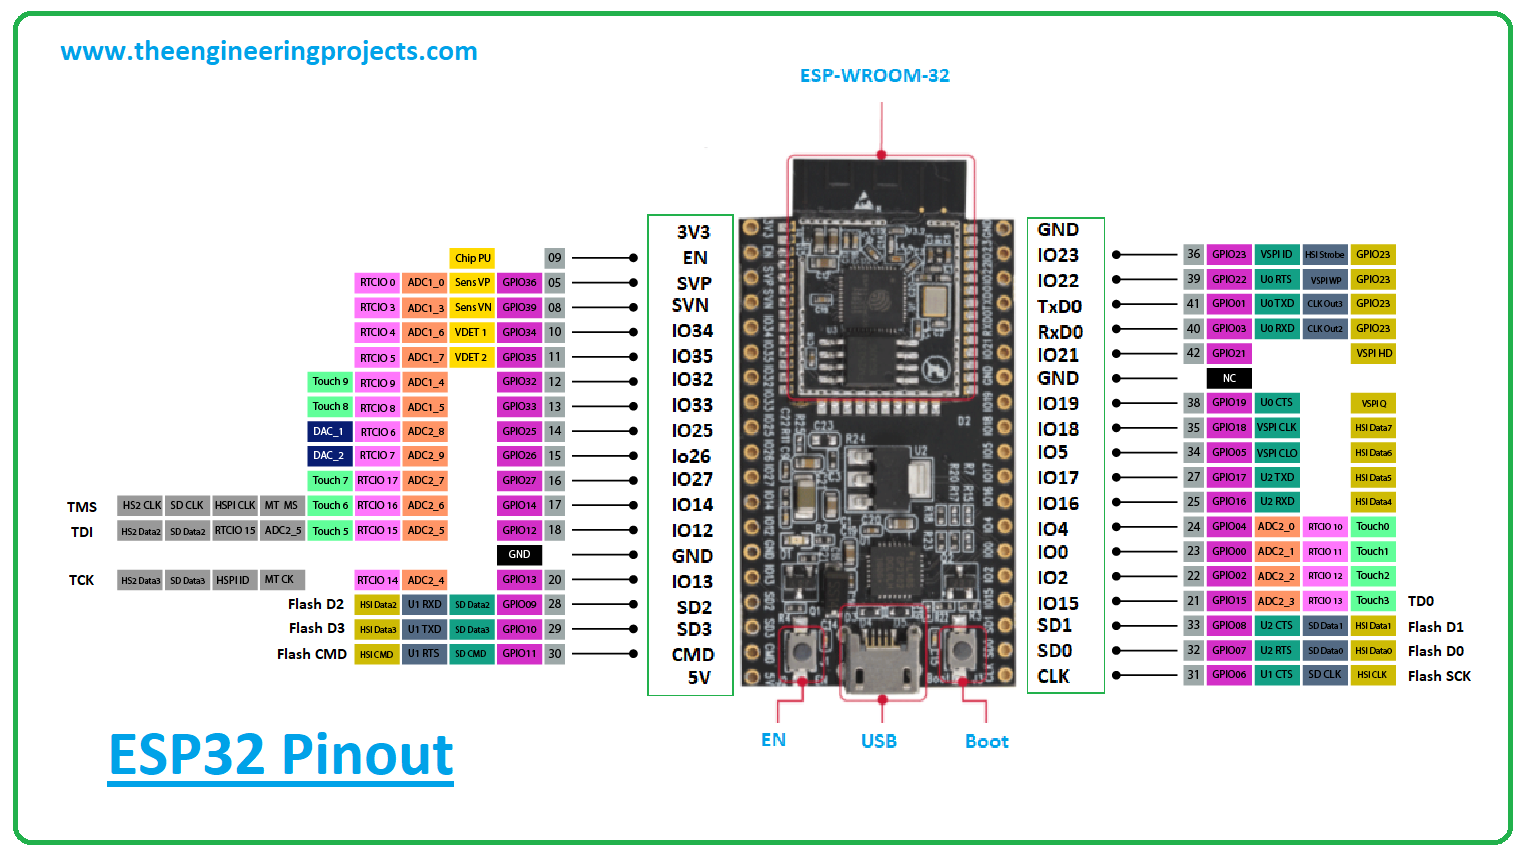 esp32 module, esp32 pinout, esp32 power ratings, esp32 applications, esp32 datasheet, esp32, esp32 features